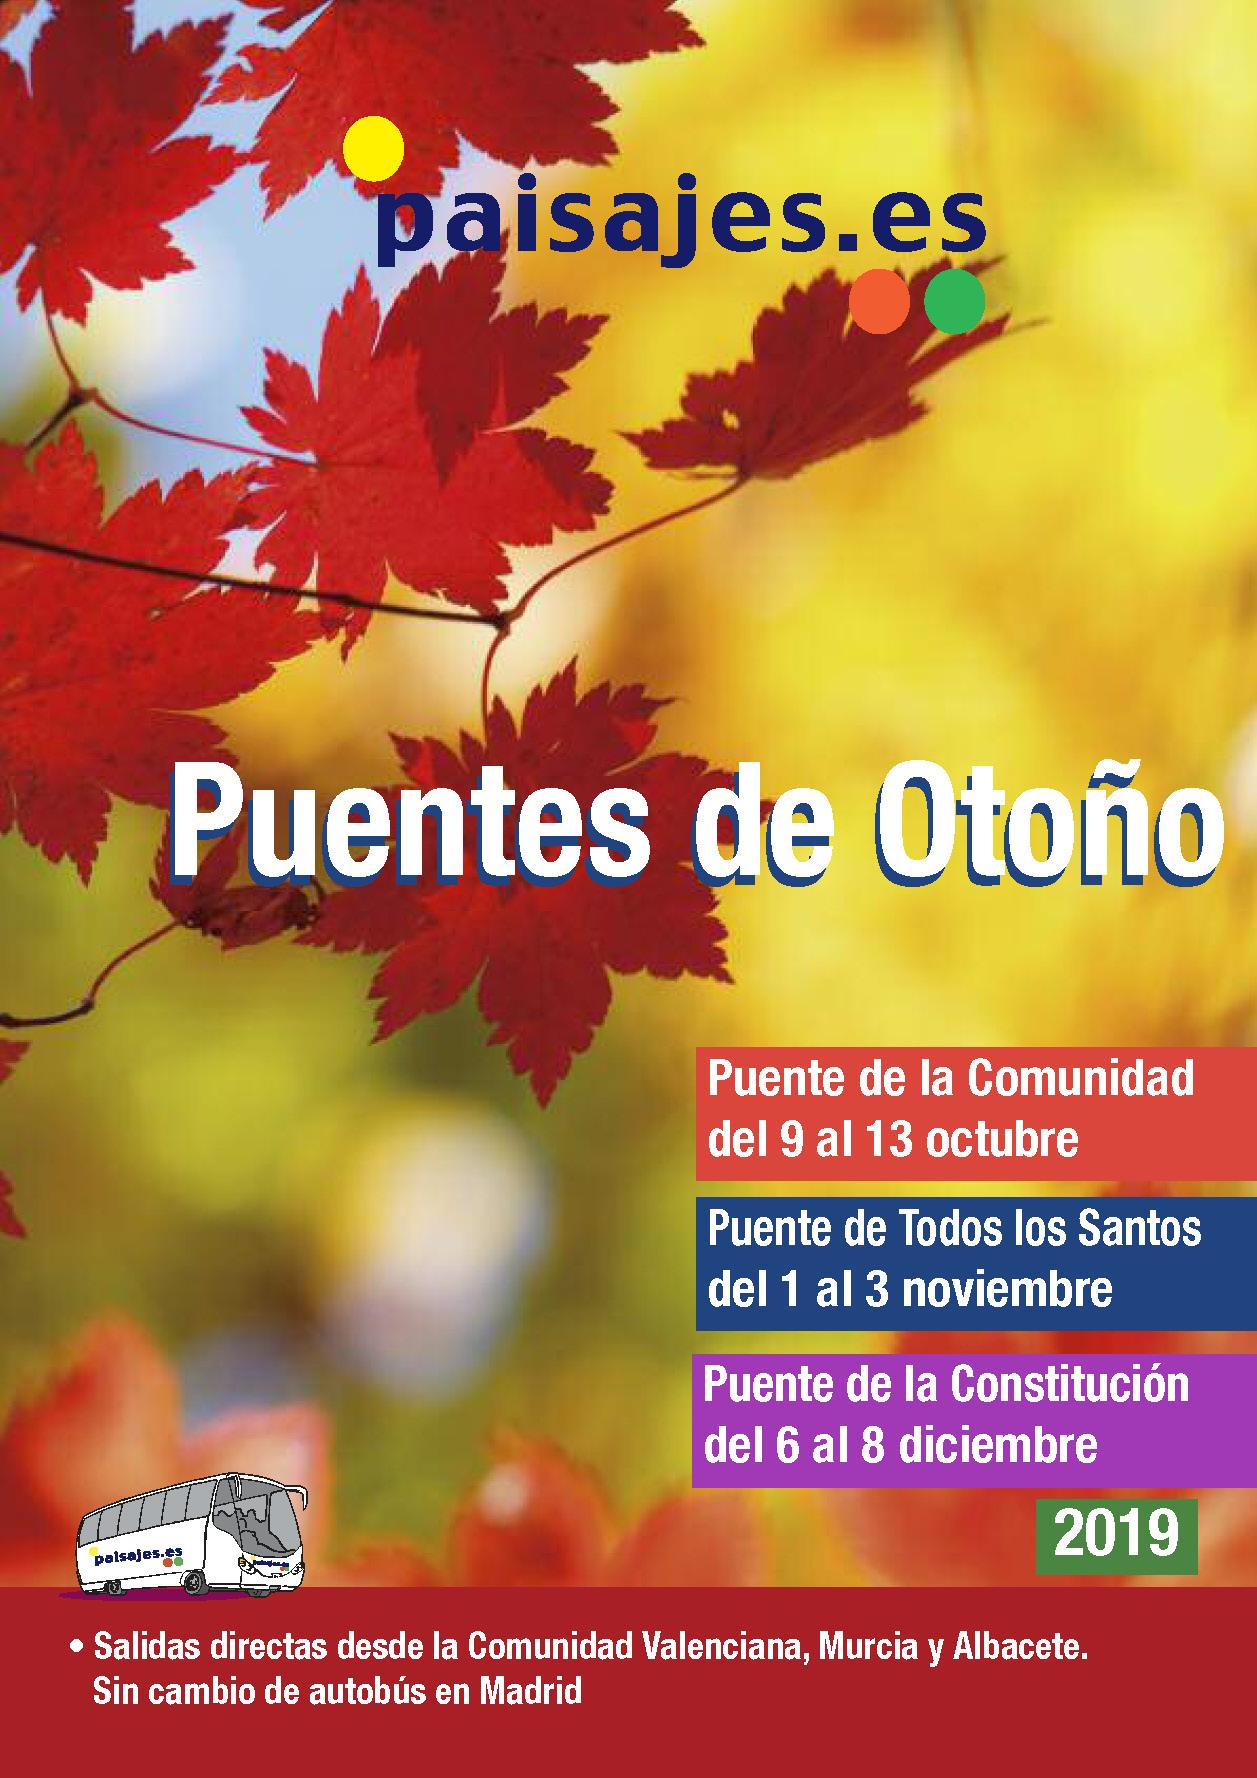 Catalogo Paisajes Puentes de Otoño 2019